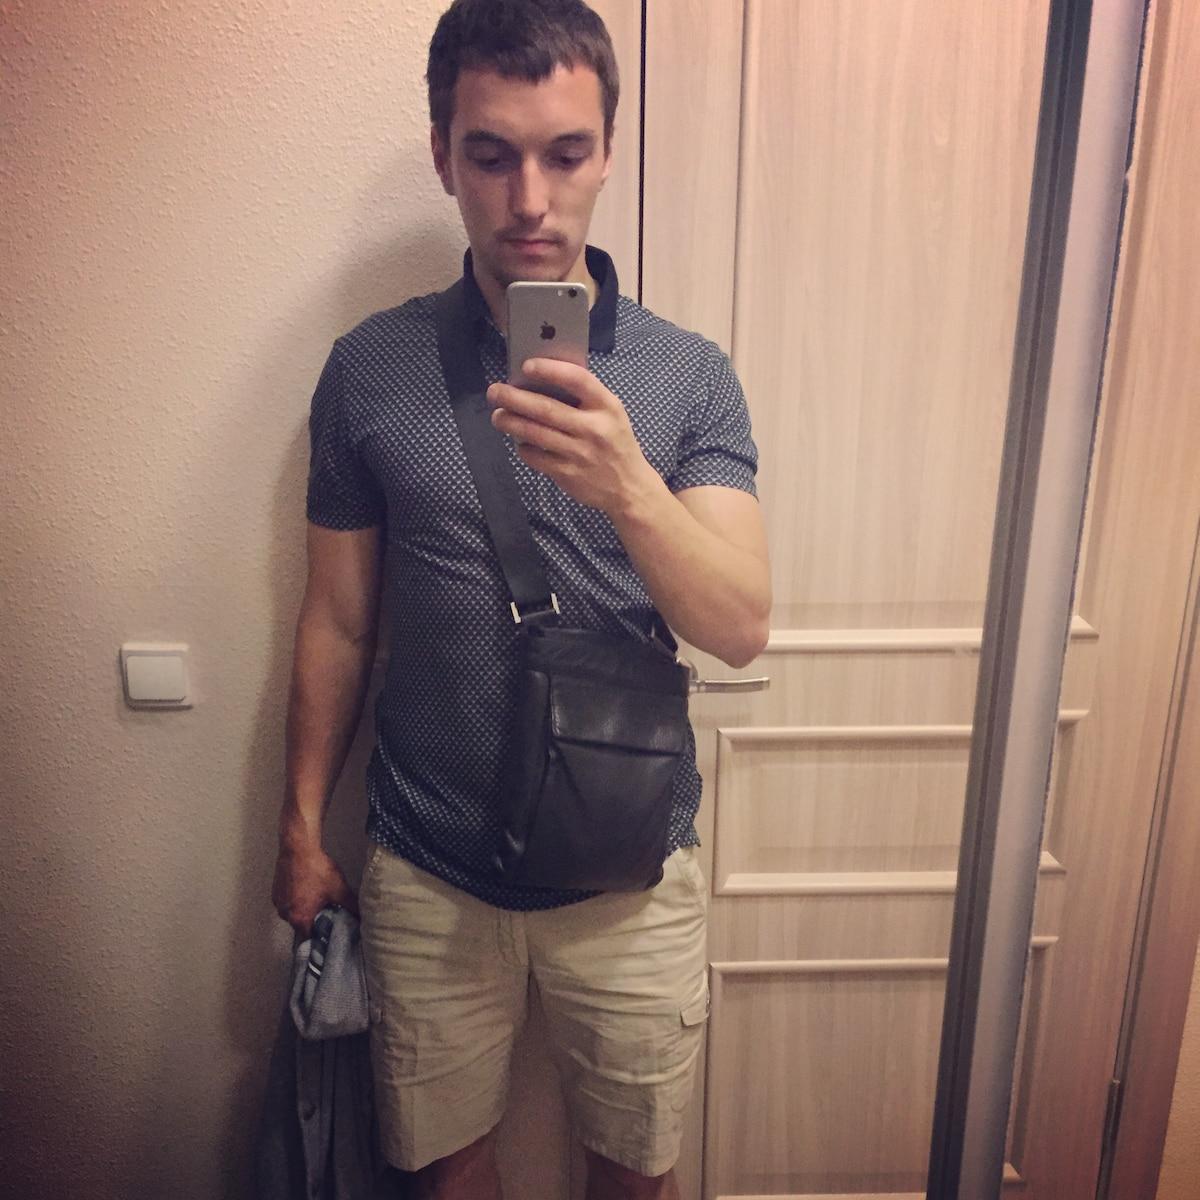 Egor From Saint Petersburg, Russia